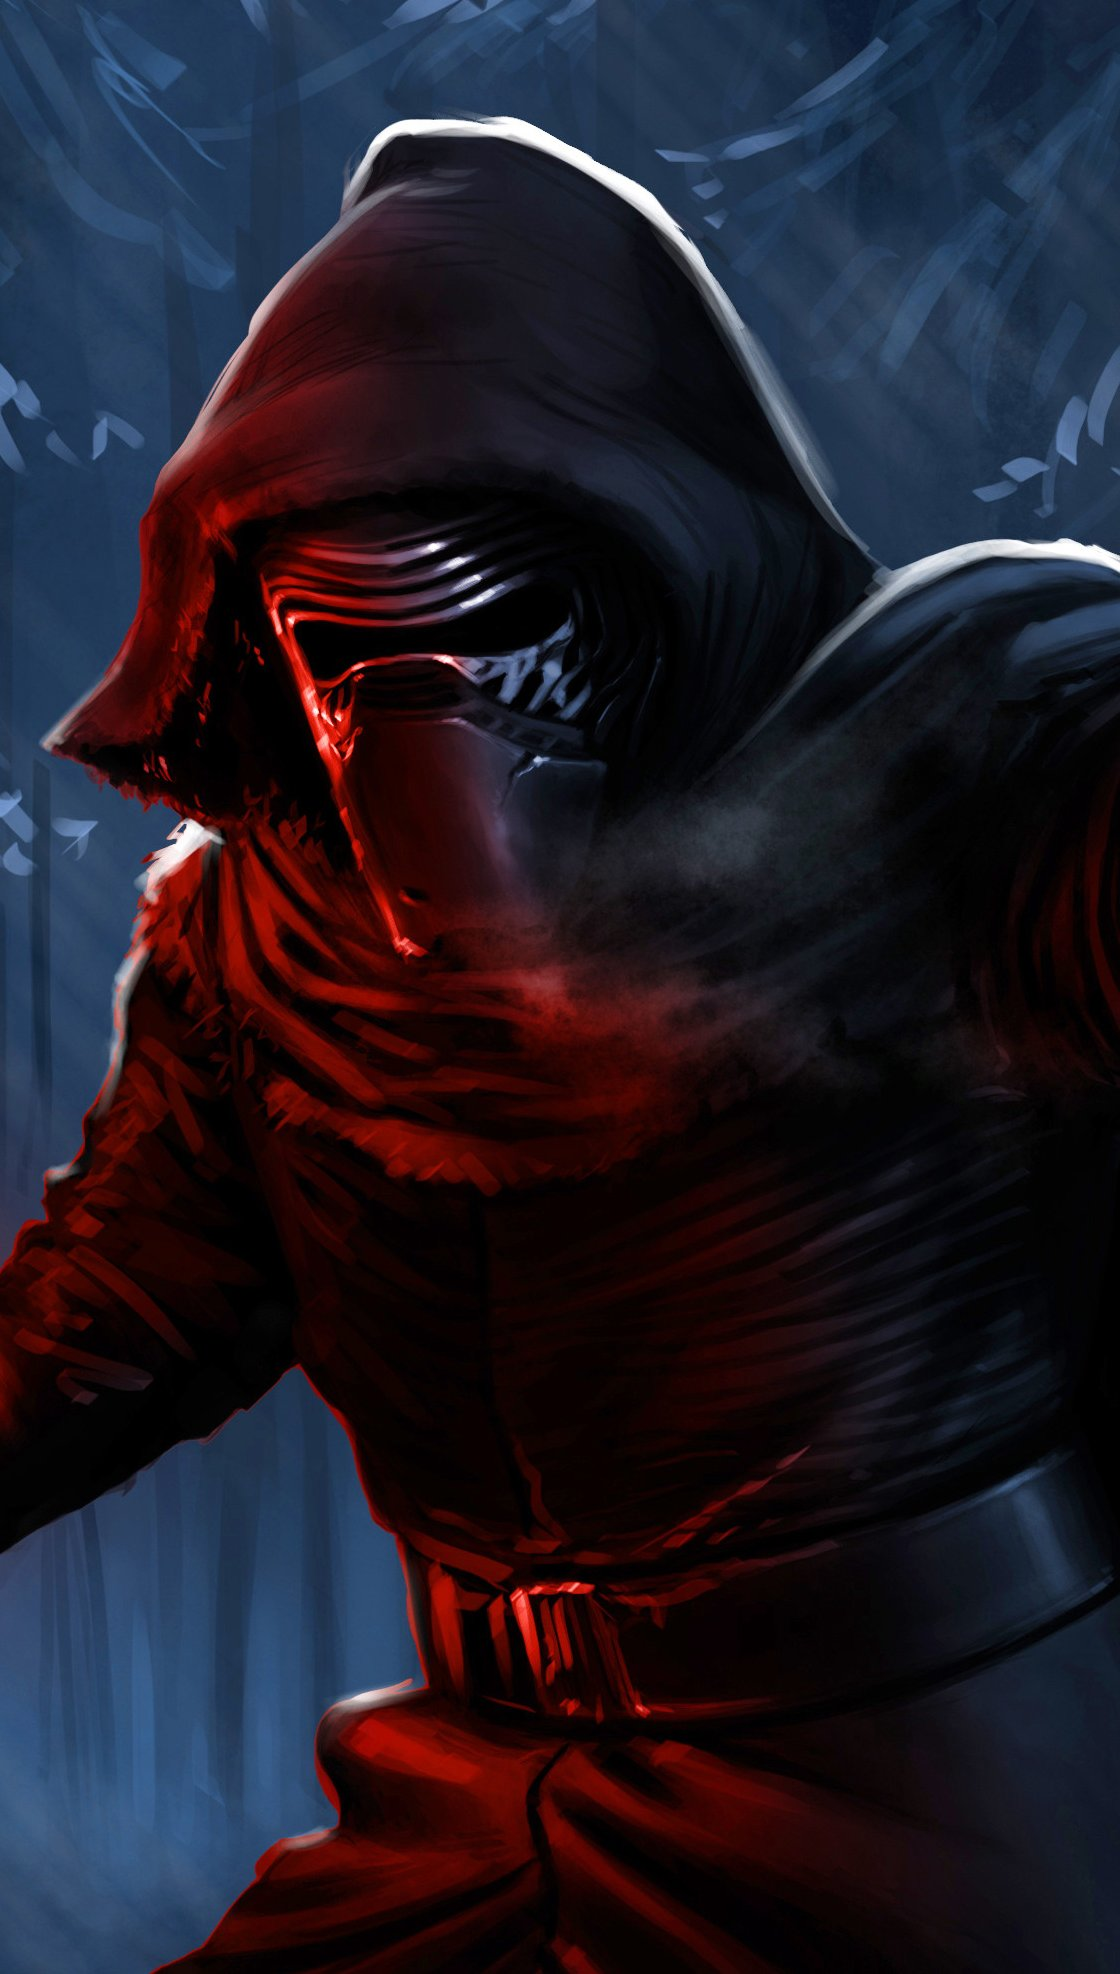 Fondos de pantalla Darth Vader con sable de luz Fanart Vertical